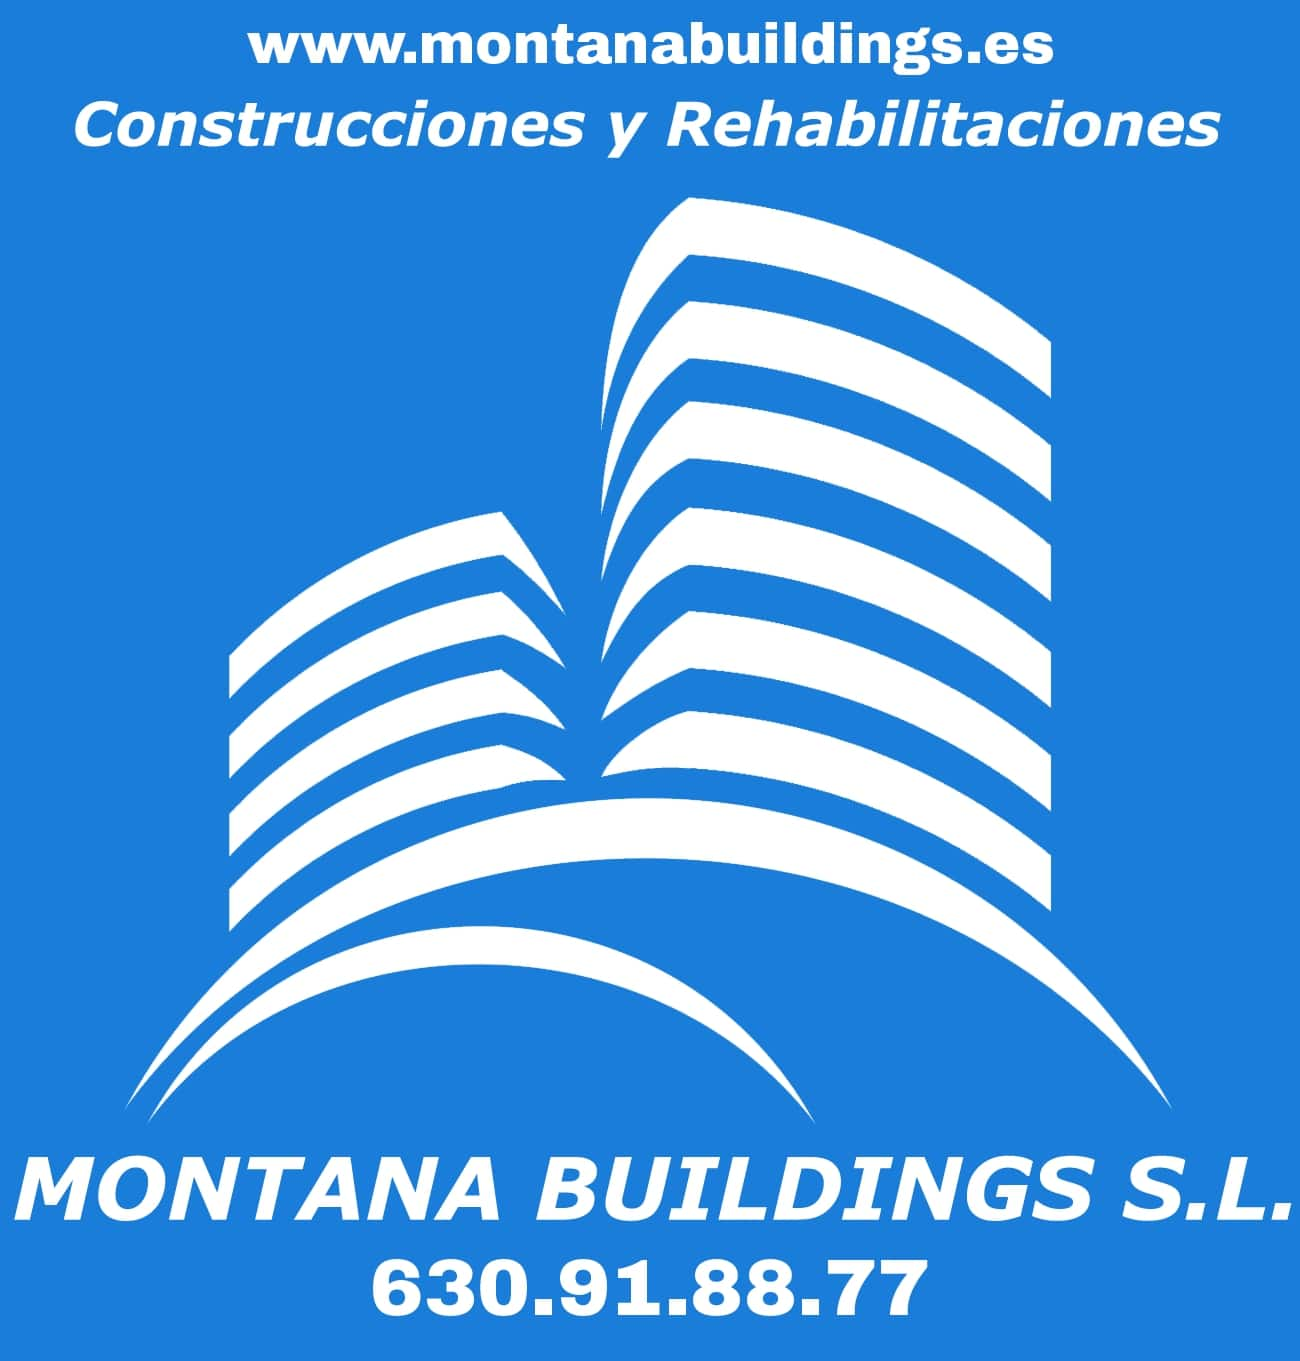 Montana Buildings Sl